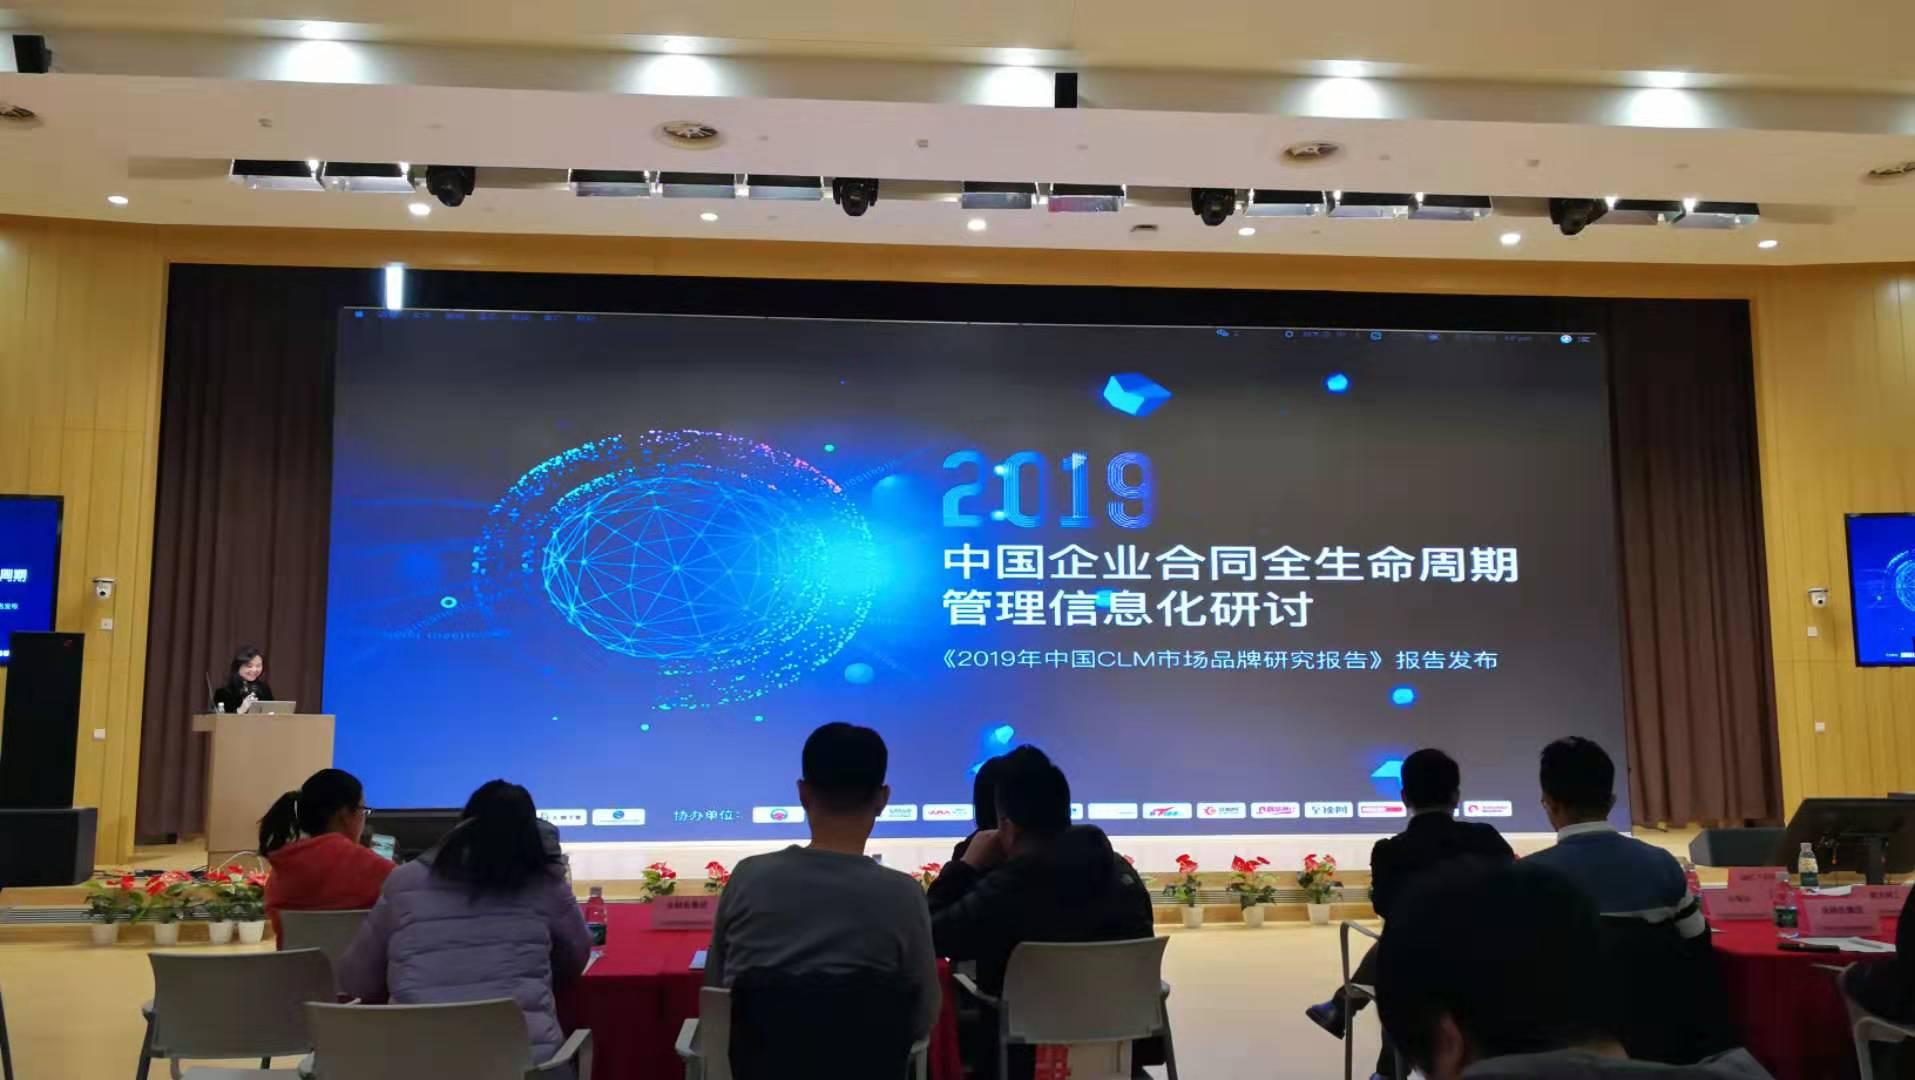 【ToB观察】合同生命周期管理蓄势待发,《2019年中国CLM市场品牌研究报告》发布